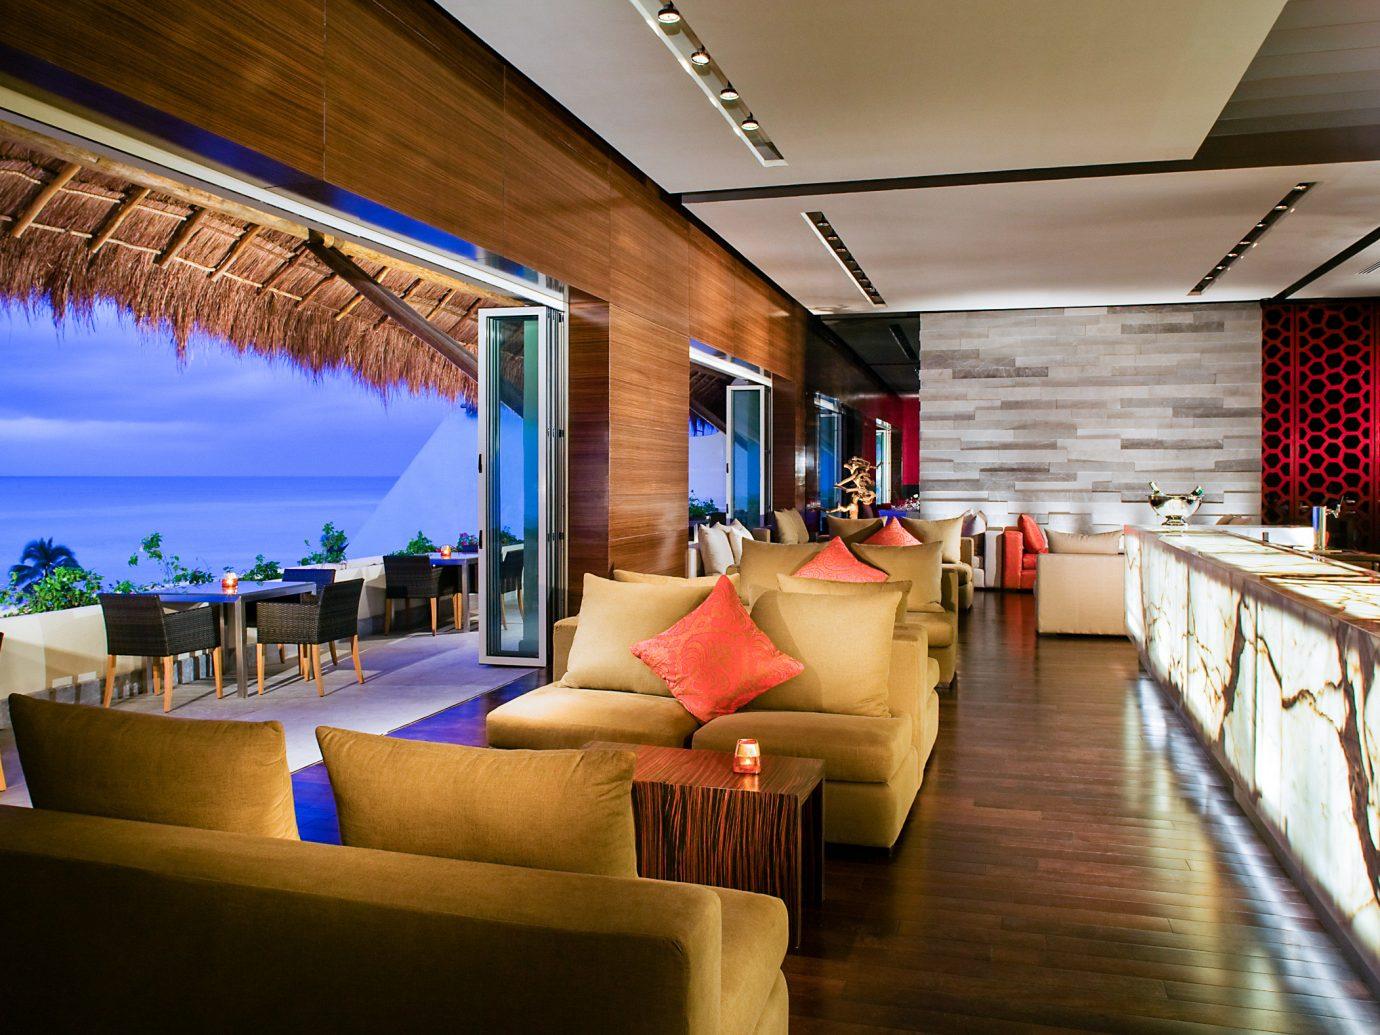 Restaurant at Grand Velas, Riviera Maya